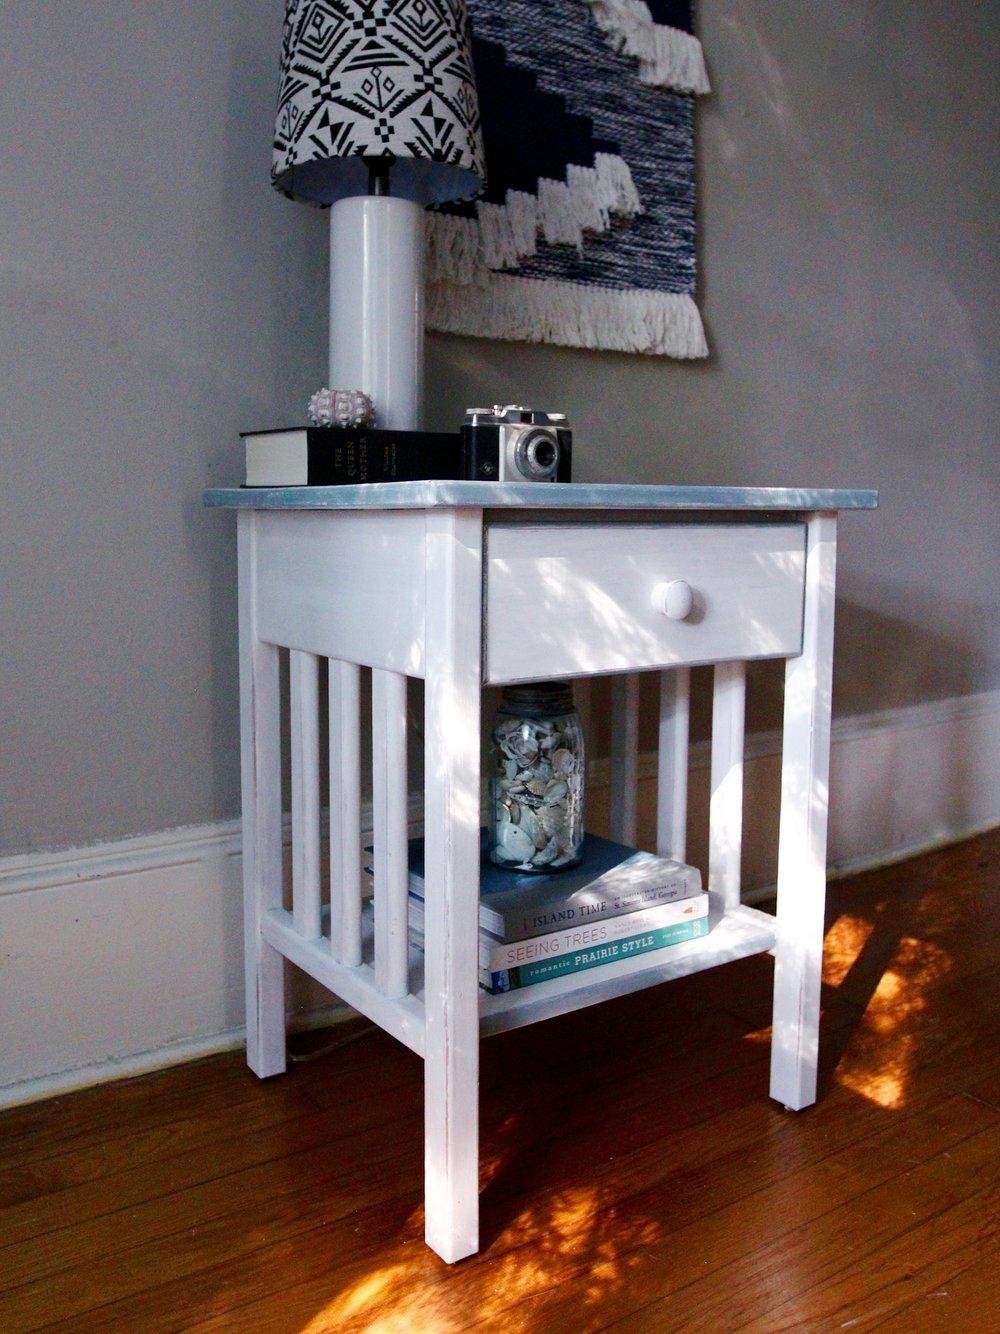 jo-torrijos-a-simpler-design-annie-sloan-pure-white-gray-trim-nightstand-atlanta-painted-furniture-4.jpg